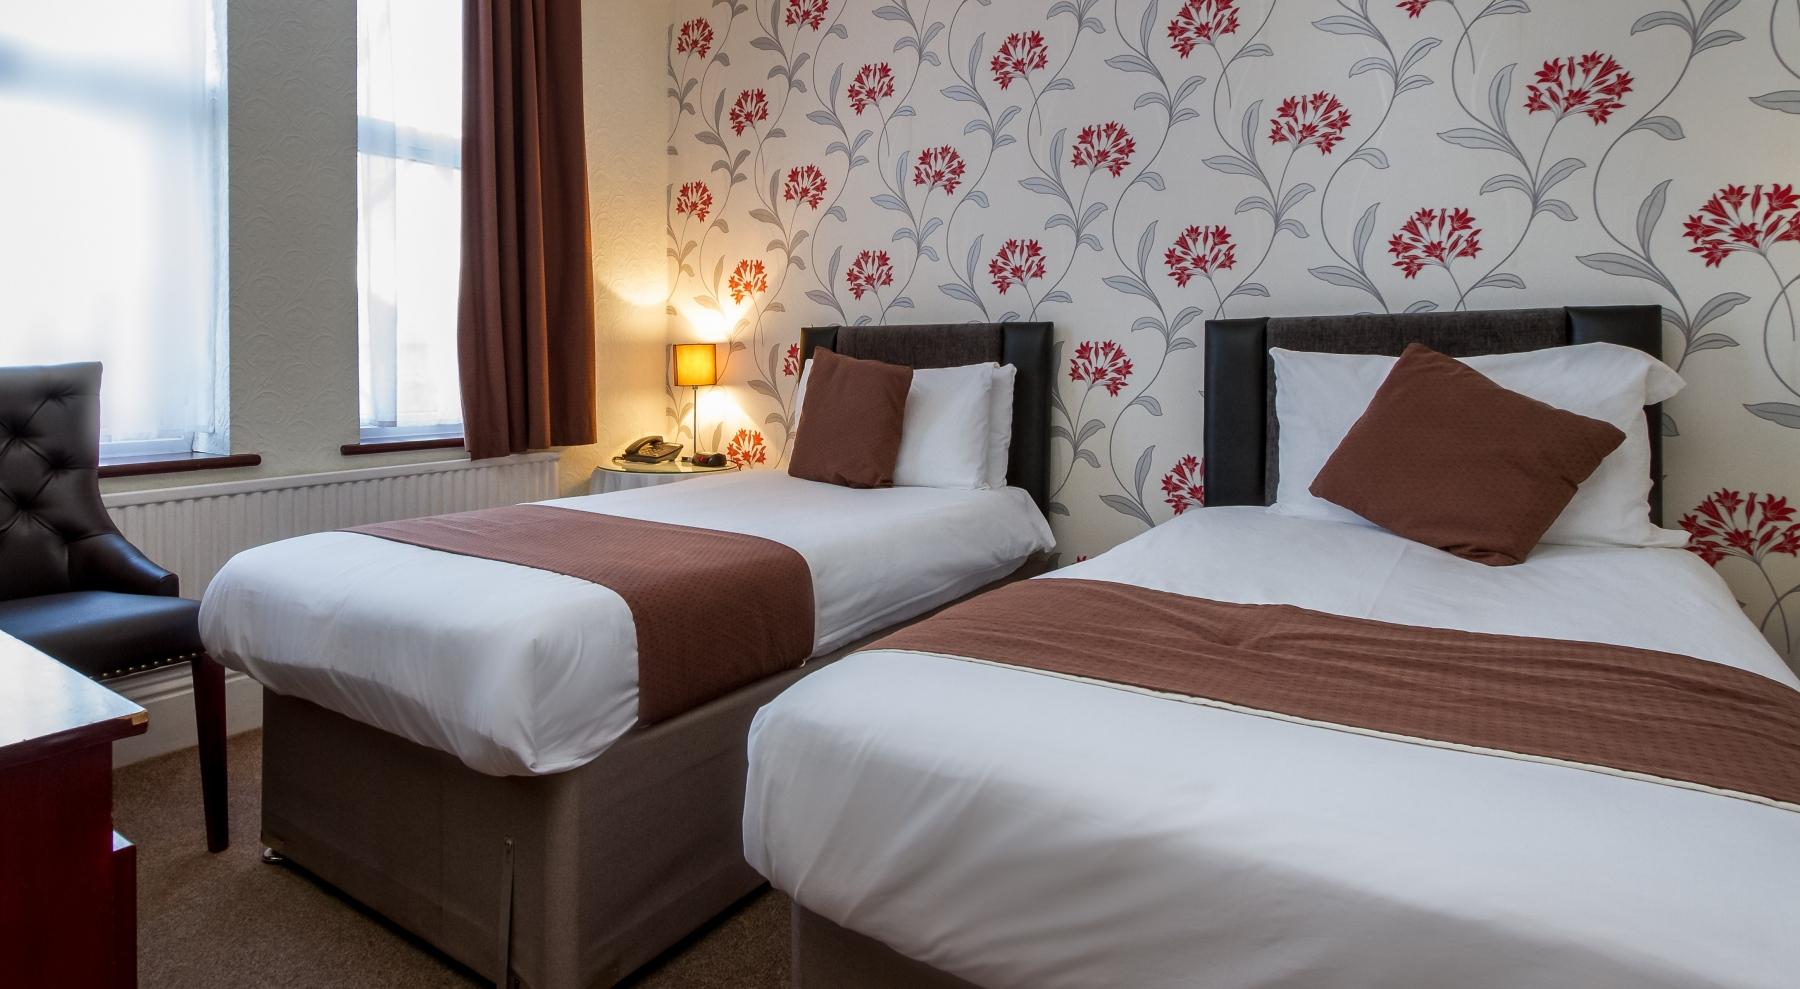 Twin_Cumbria-Park-Hotel_1-1330